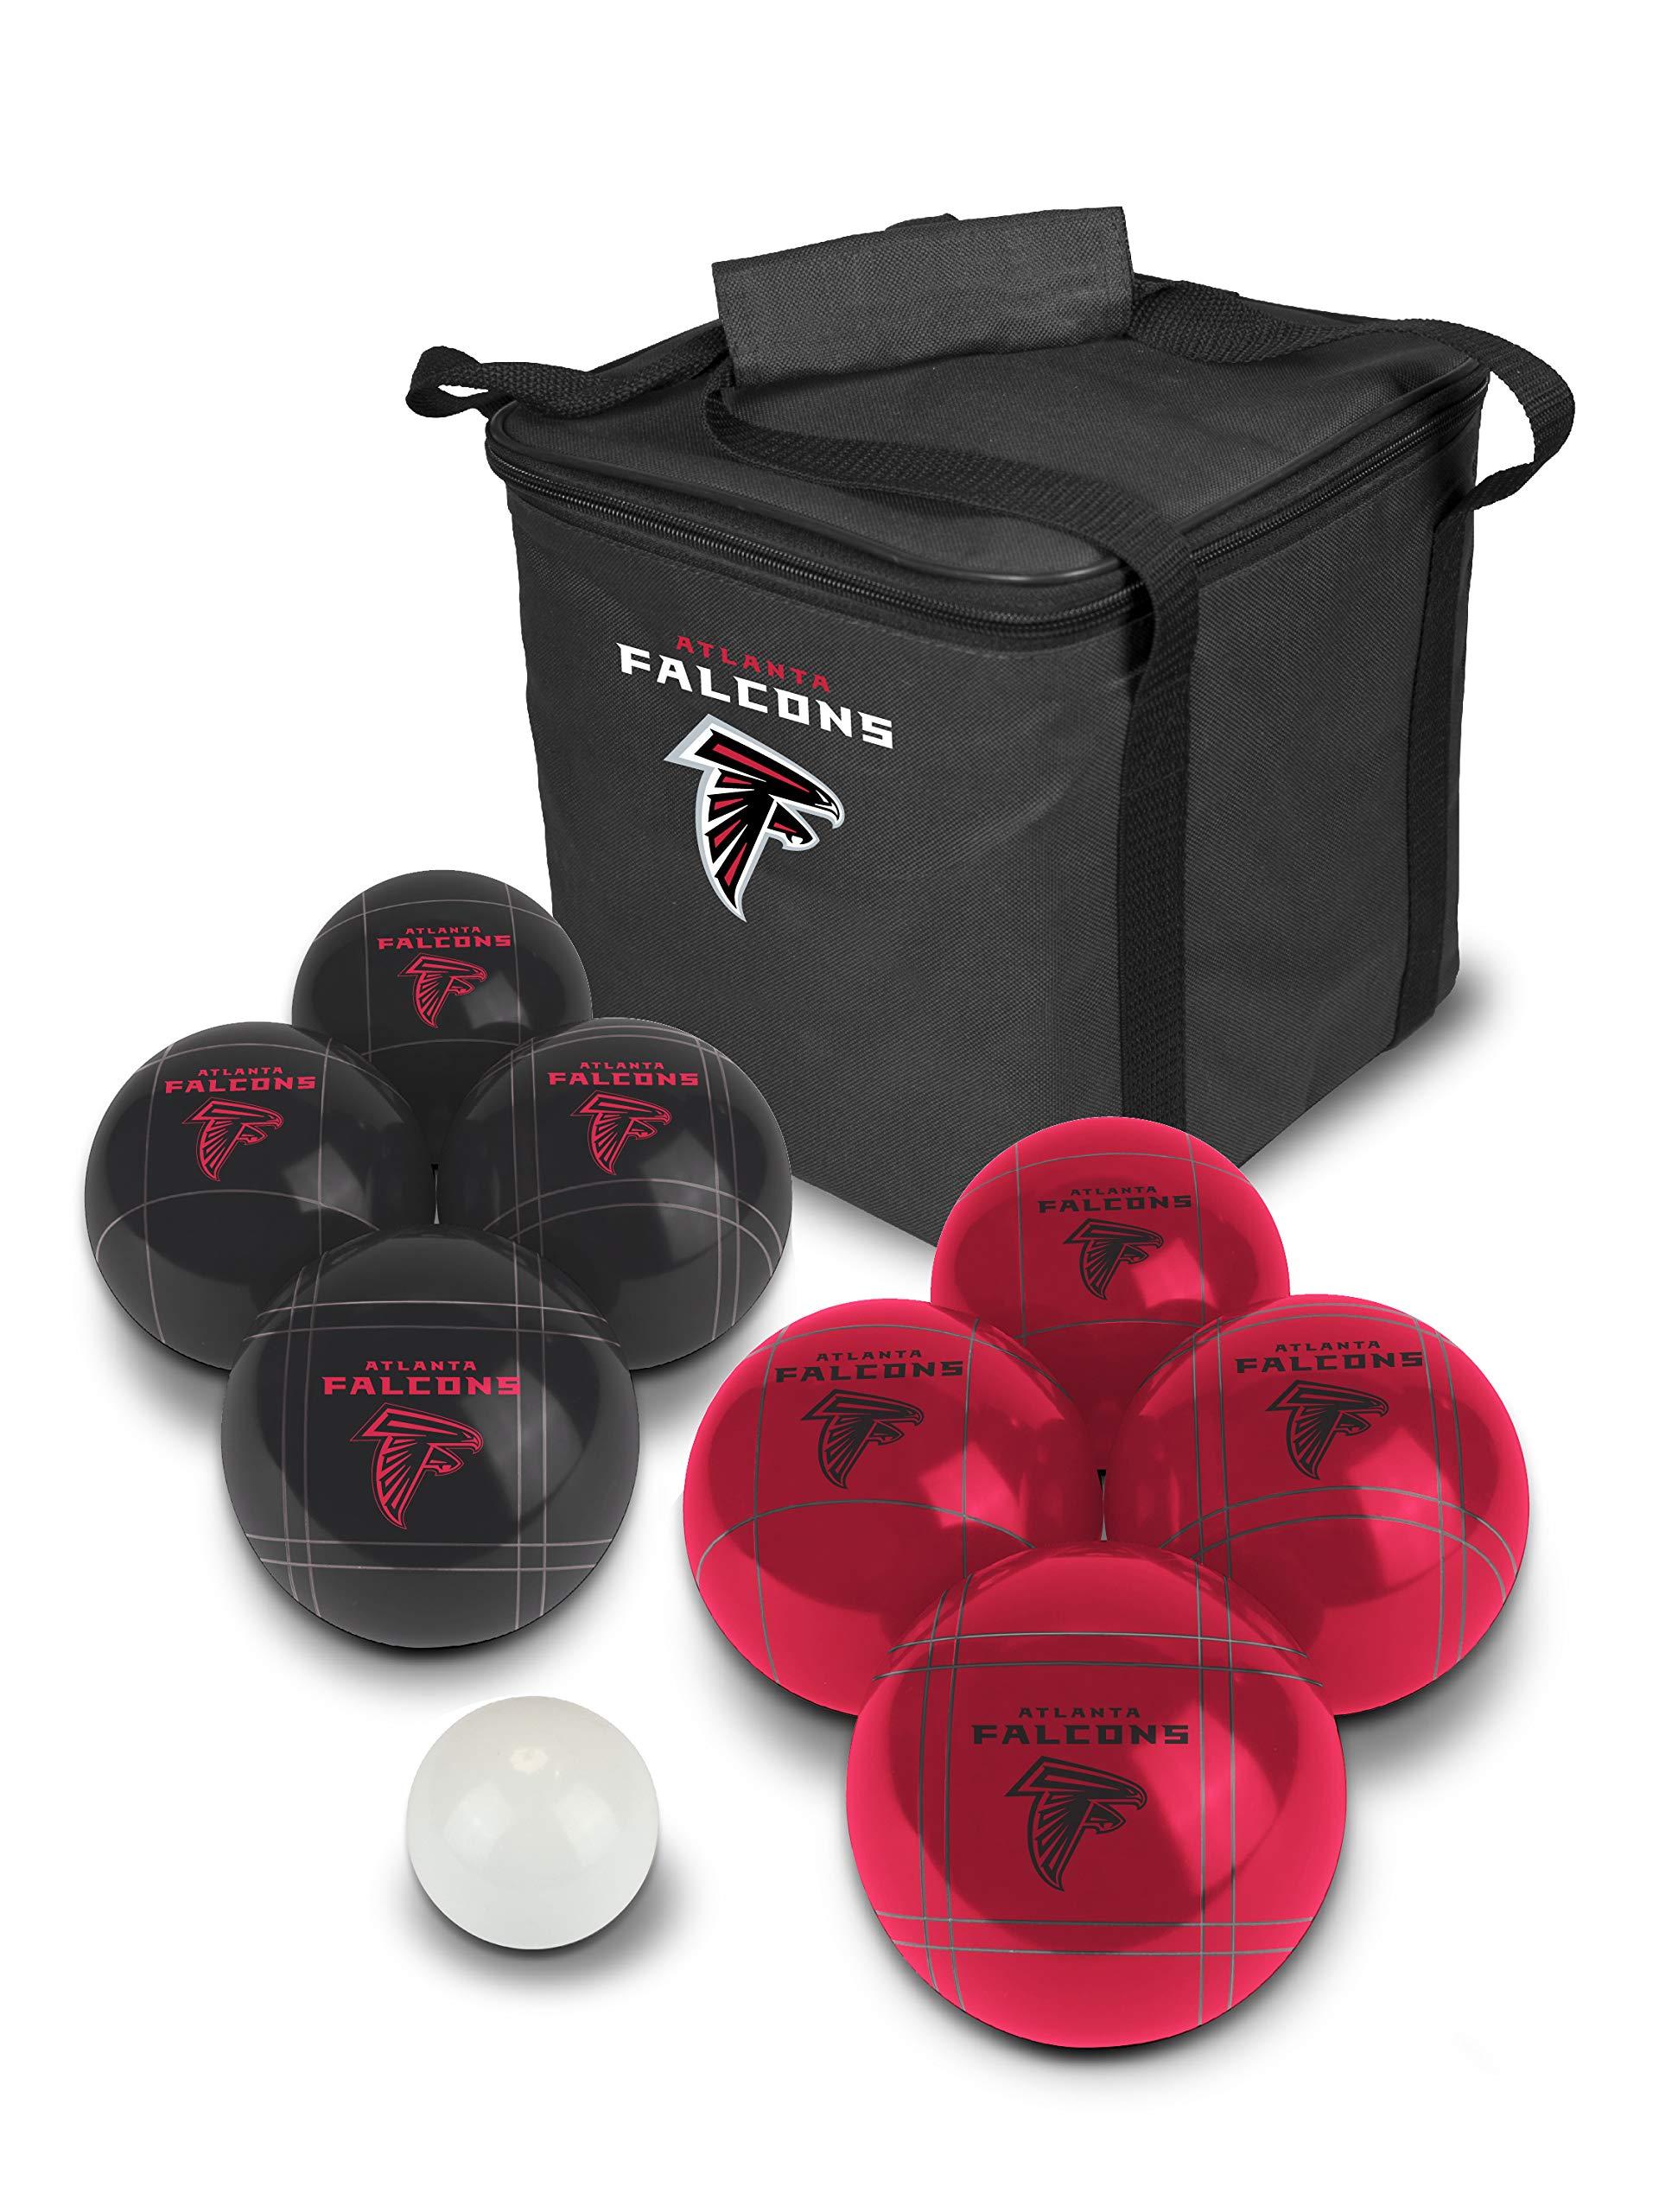 PROLINE NFL Atlanta Falcons Bocce Ball Set by PROLINE (Image #1)